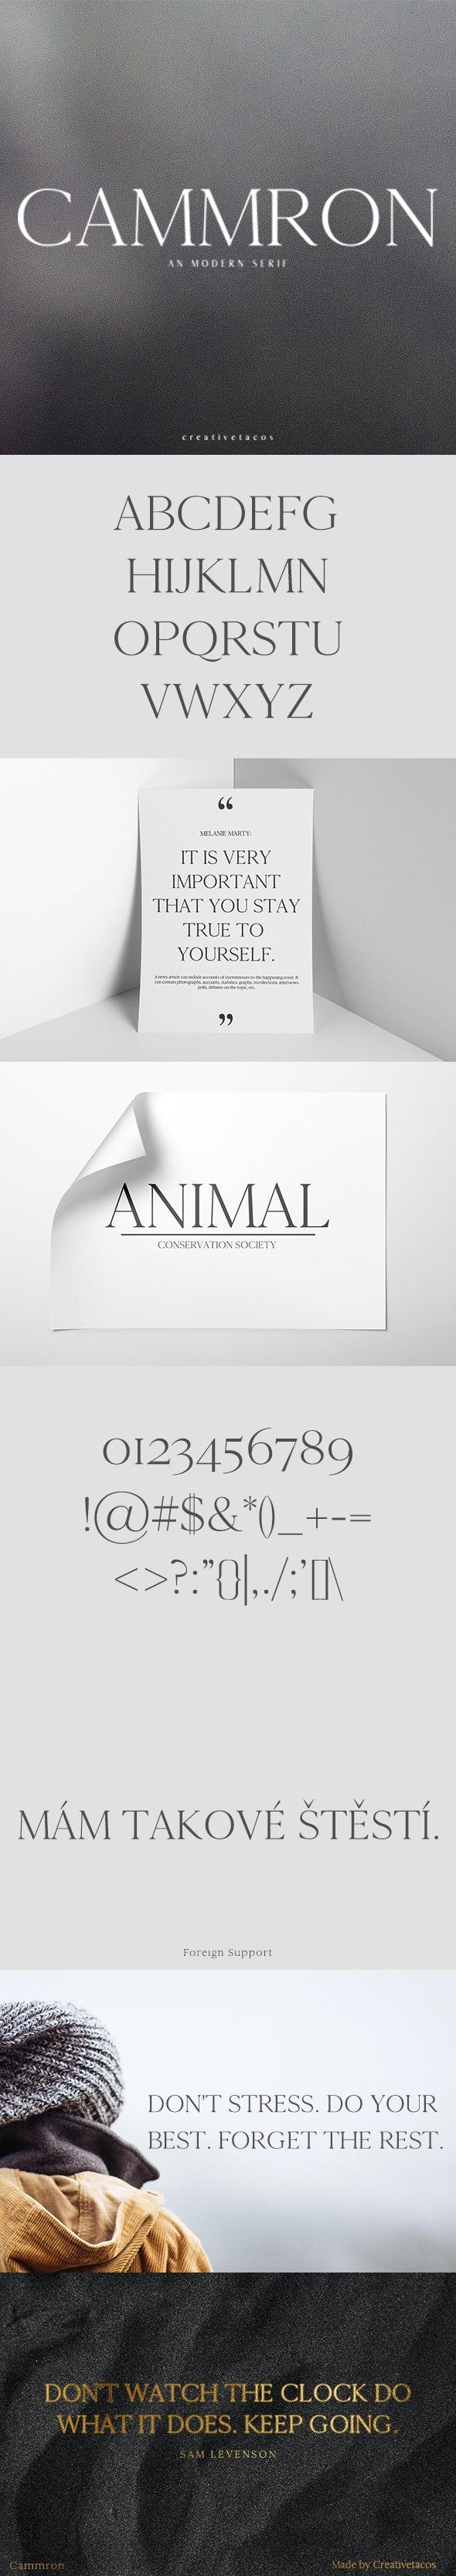 Cammron Serif Font Family - Serif Fonts